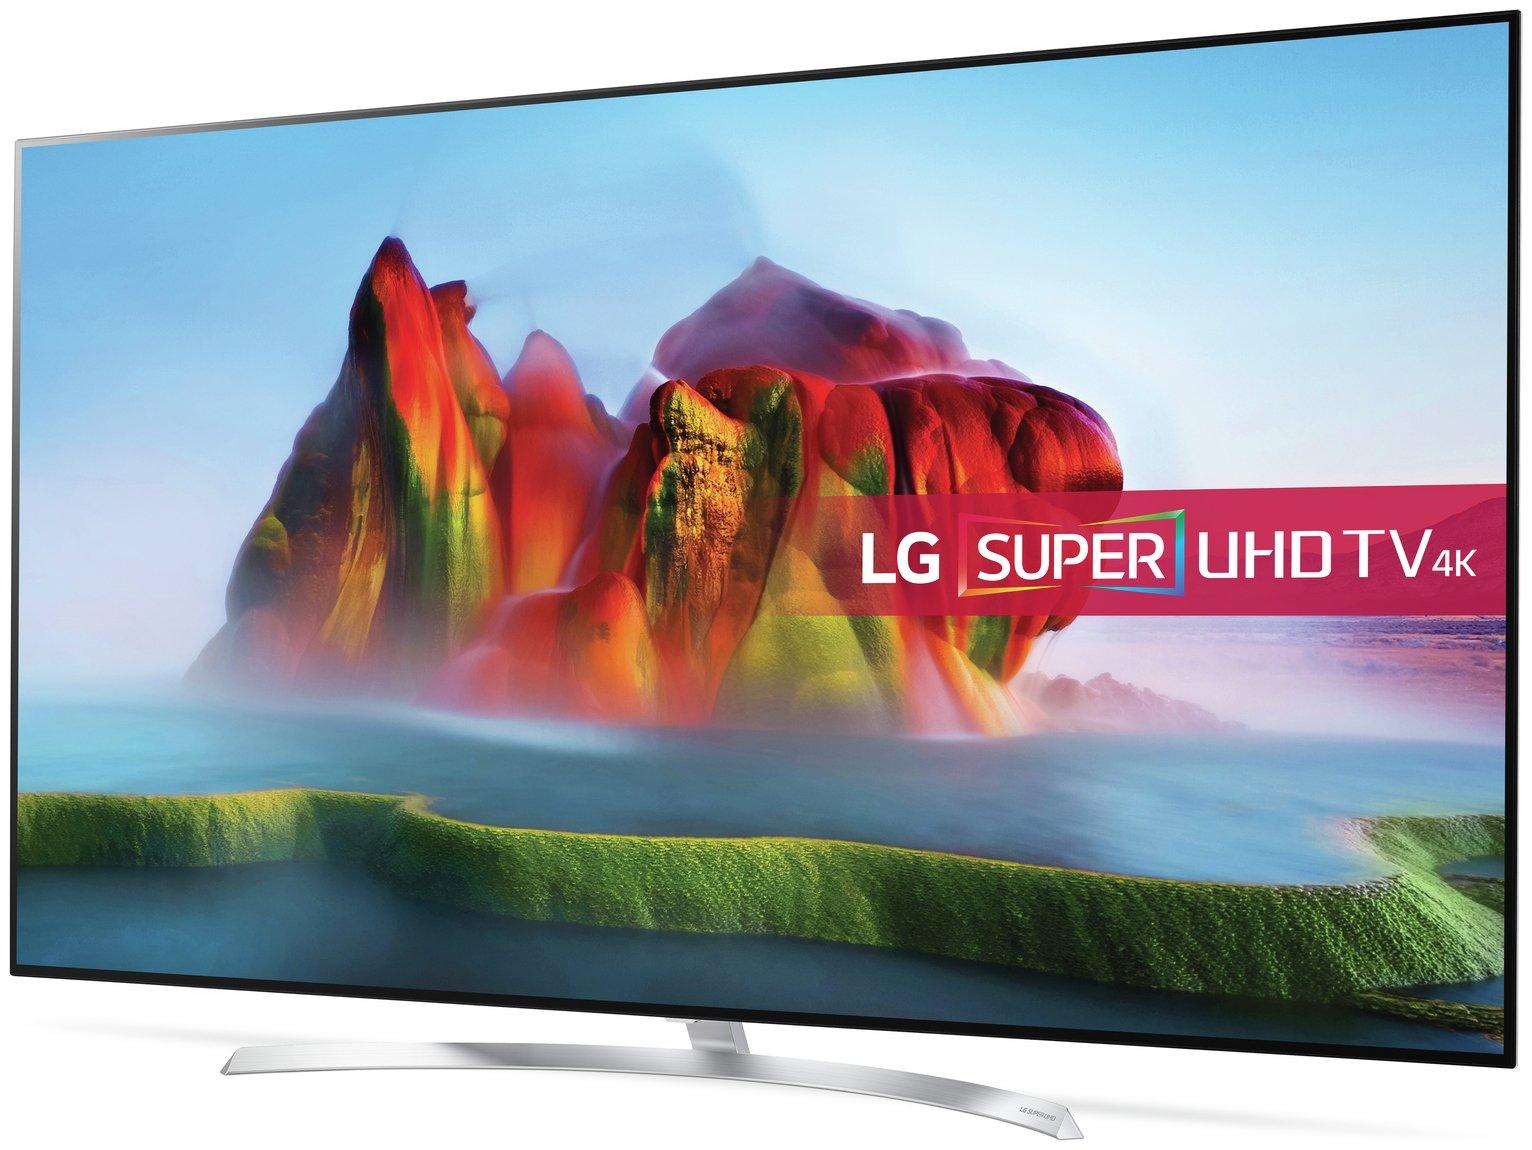 LG LG 60SJ850V 60 Inch Smart 4K Ultra HD TV with HDR